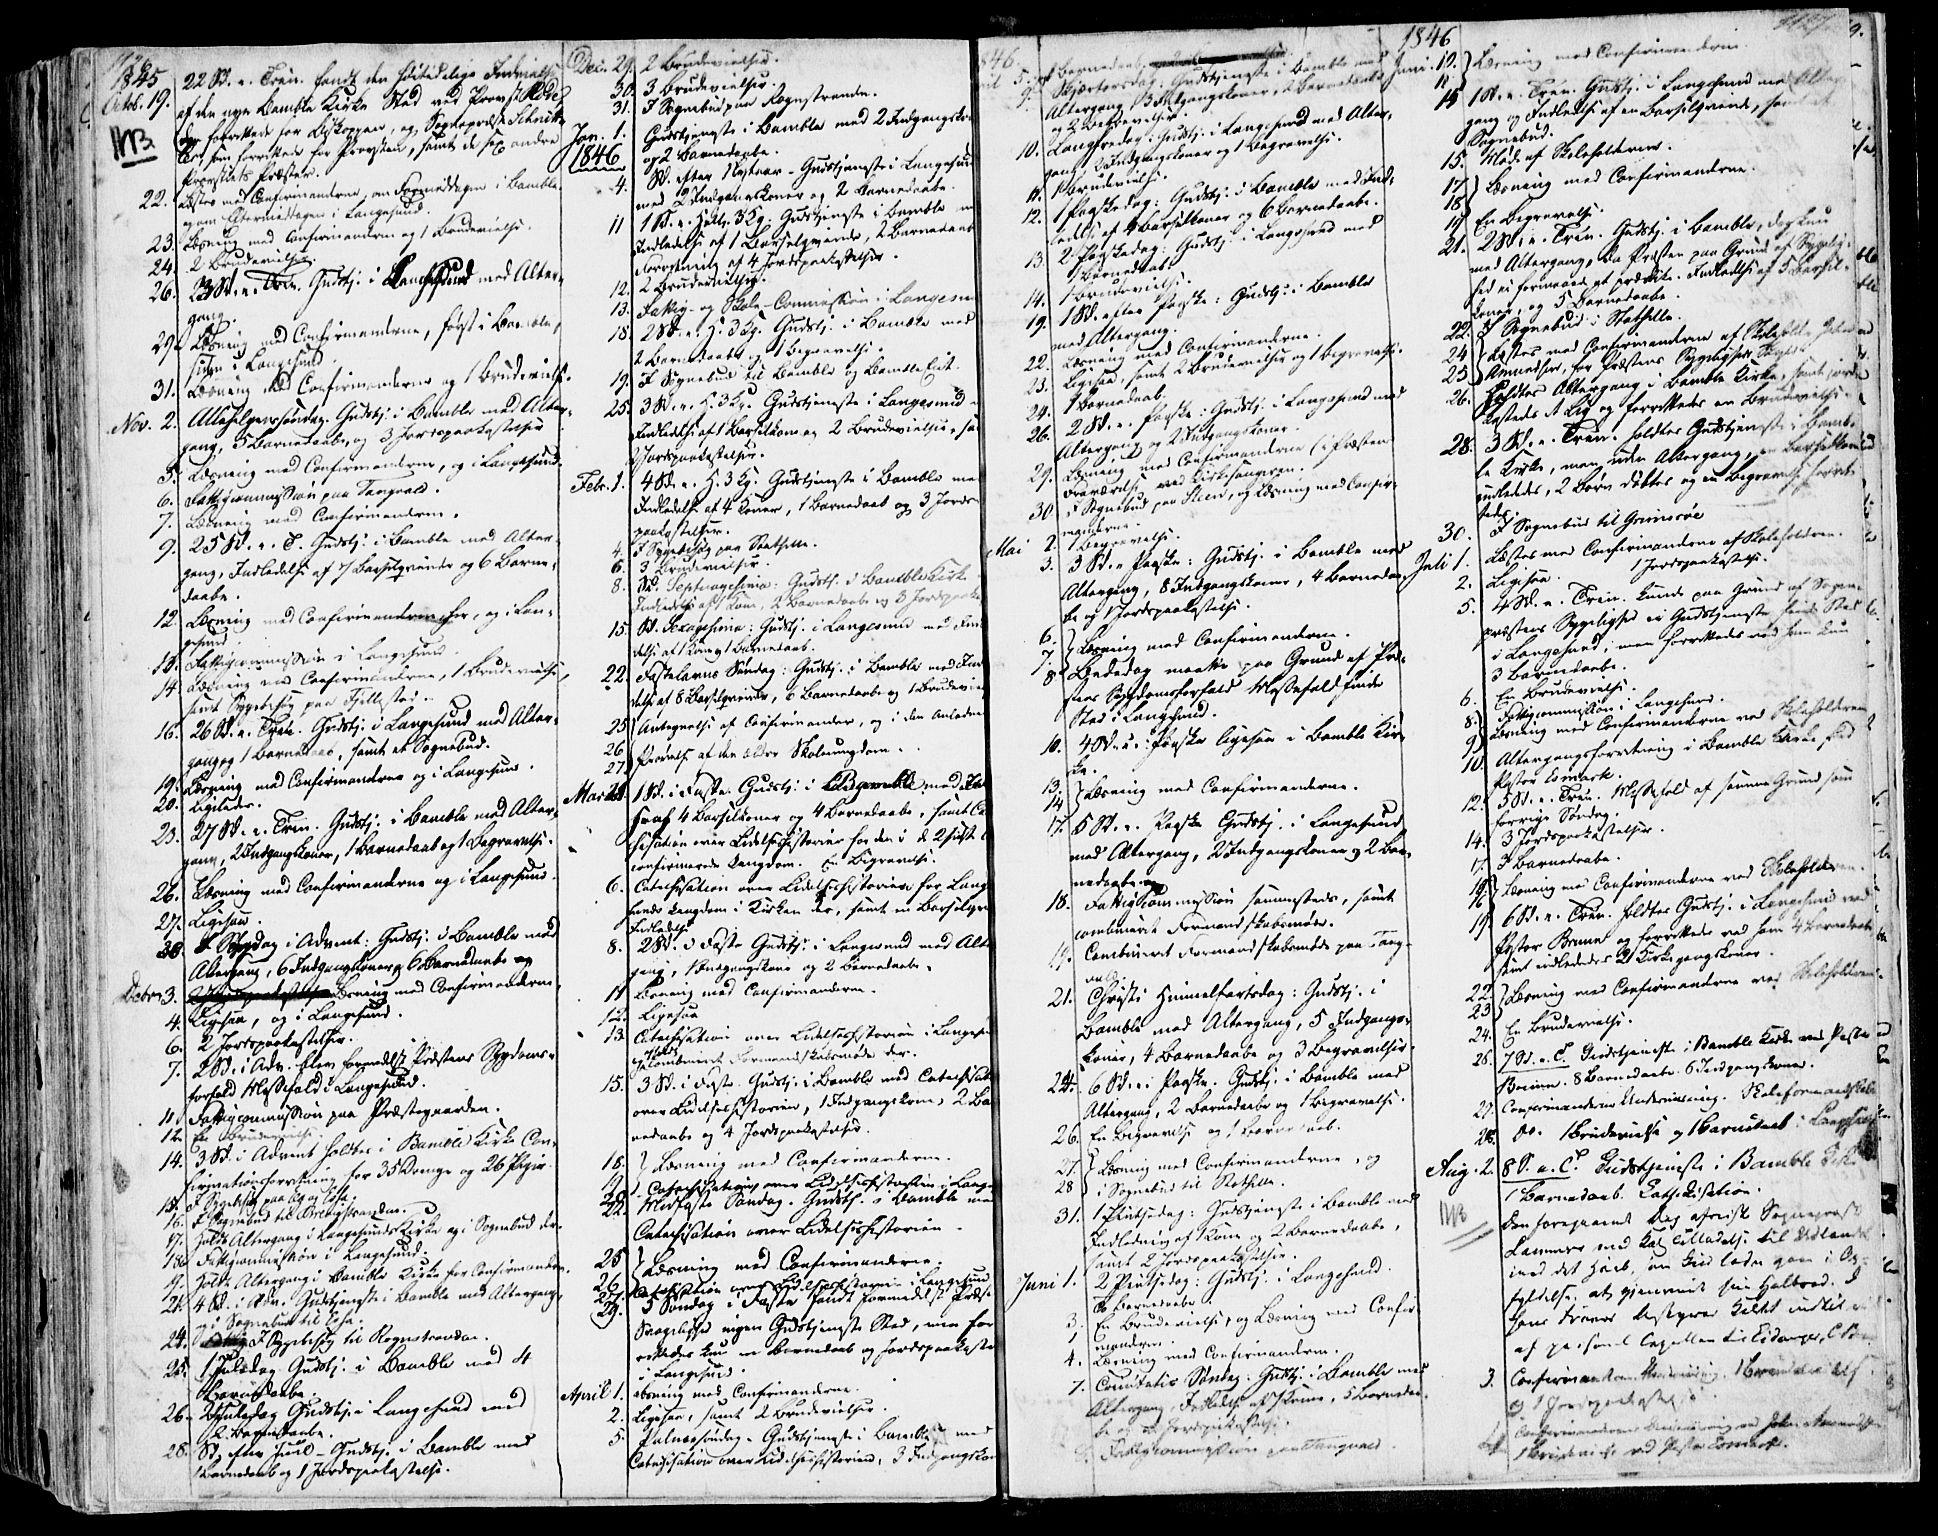 SAKO, Bamble kirkebøker, F/Fa/L0004: Ministerialbok nr. I 4, 1834-1853, s. 1126-1127